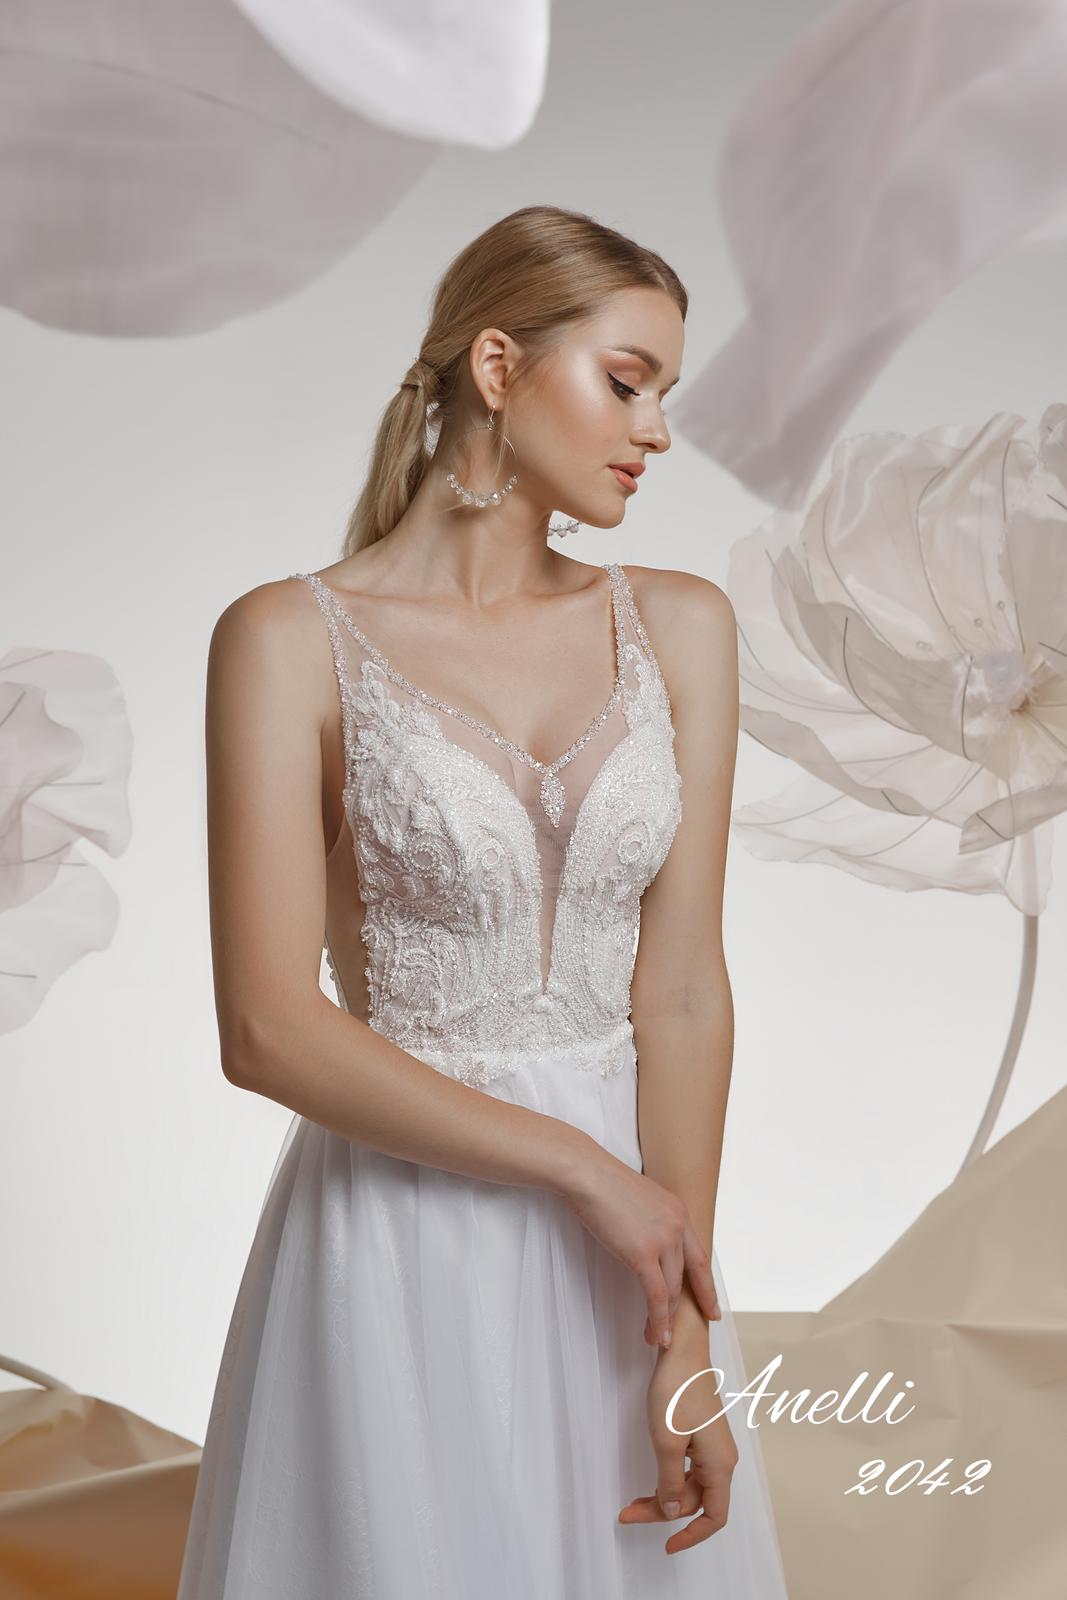 Svadobné šaty - Imagine 2042 - Obrázok č. 2